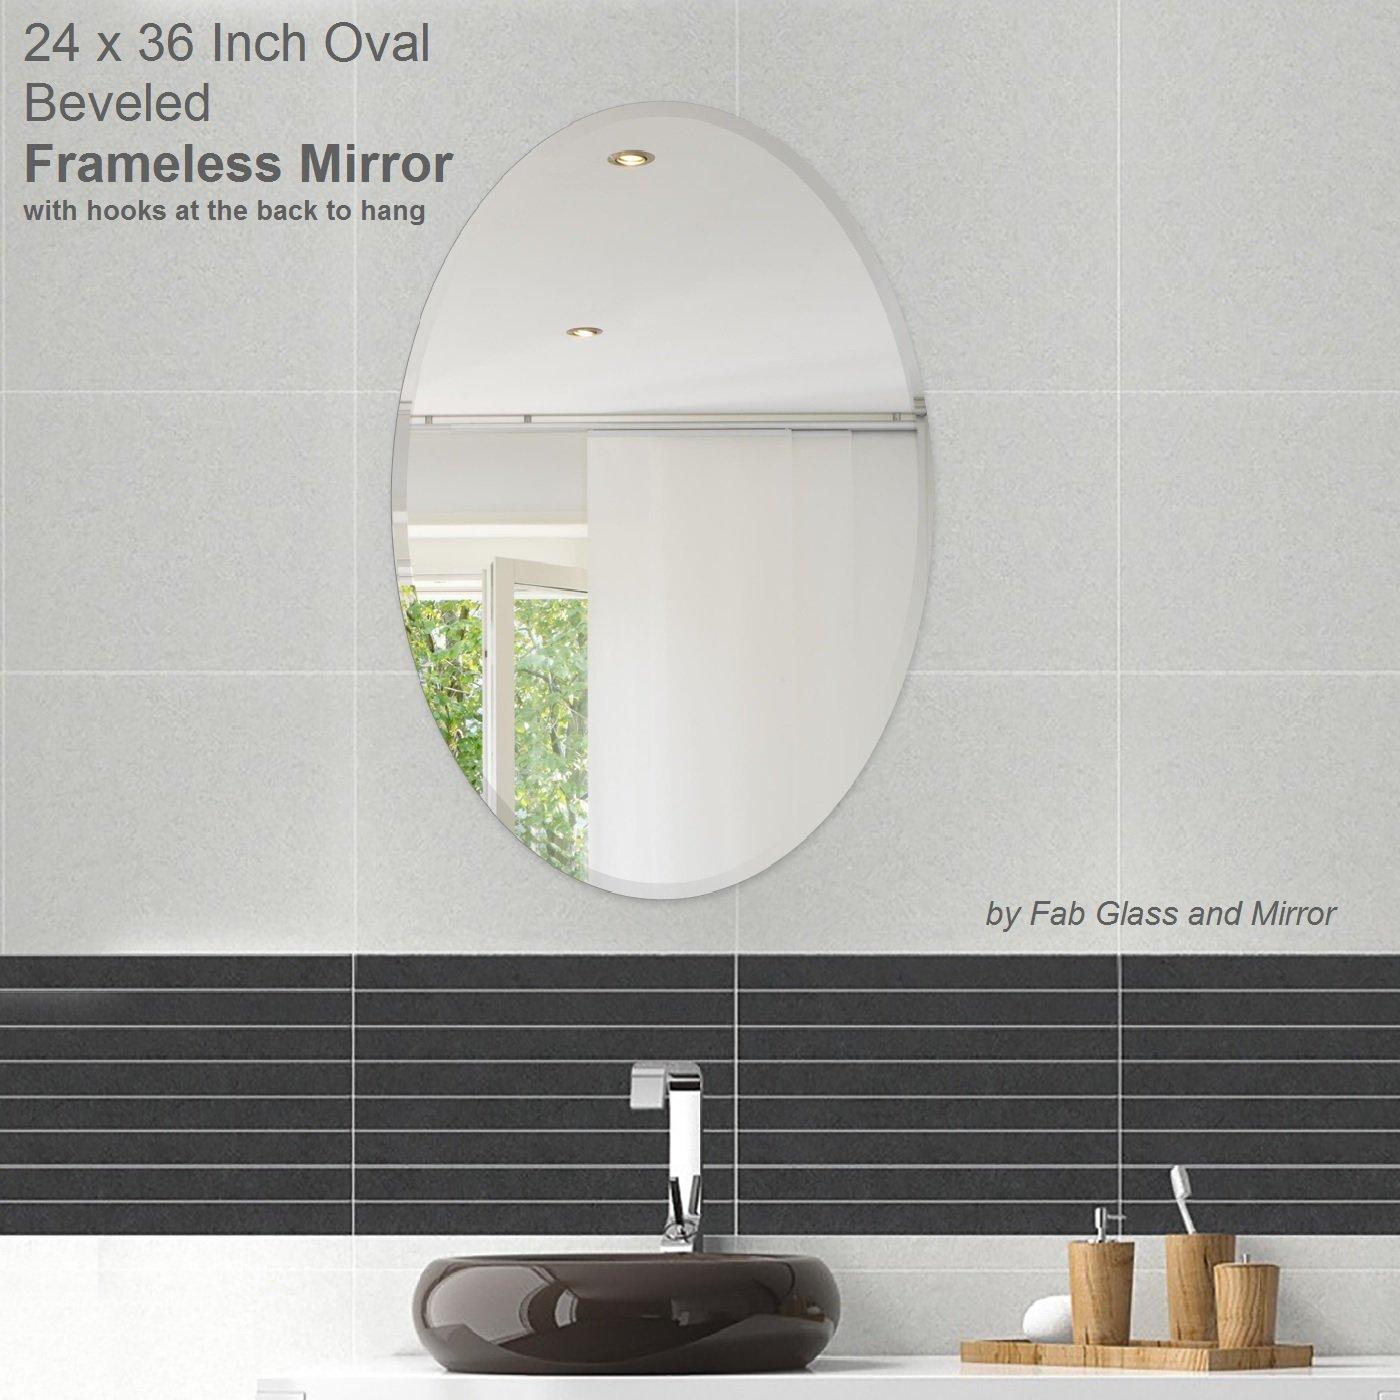 Amazon.com: Fab Glass and Mirror Oval Beveled Polish Frameless Wall ...